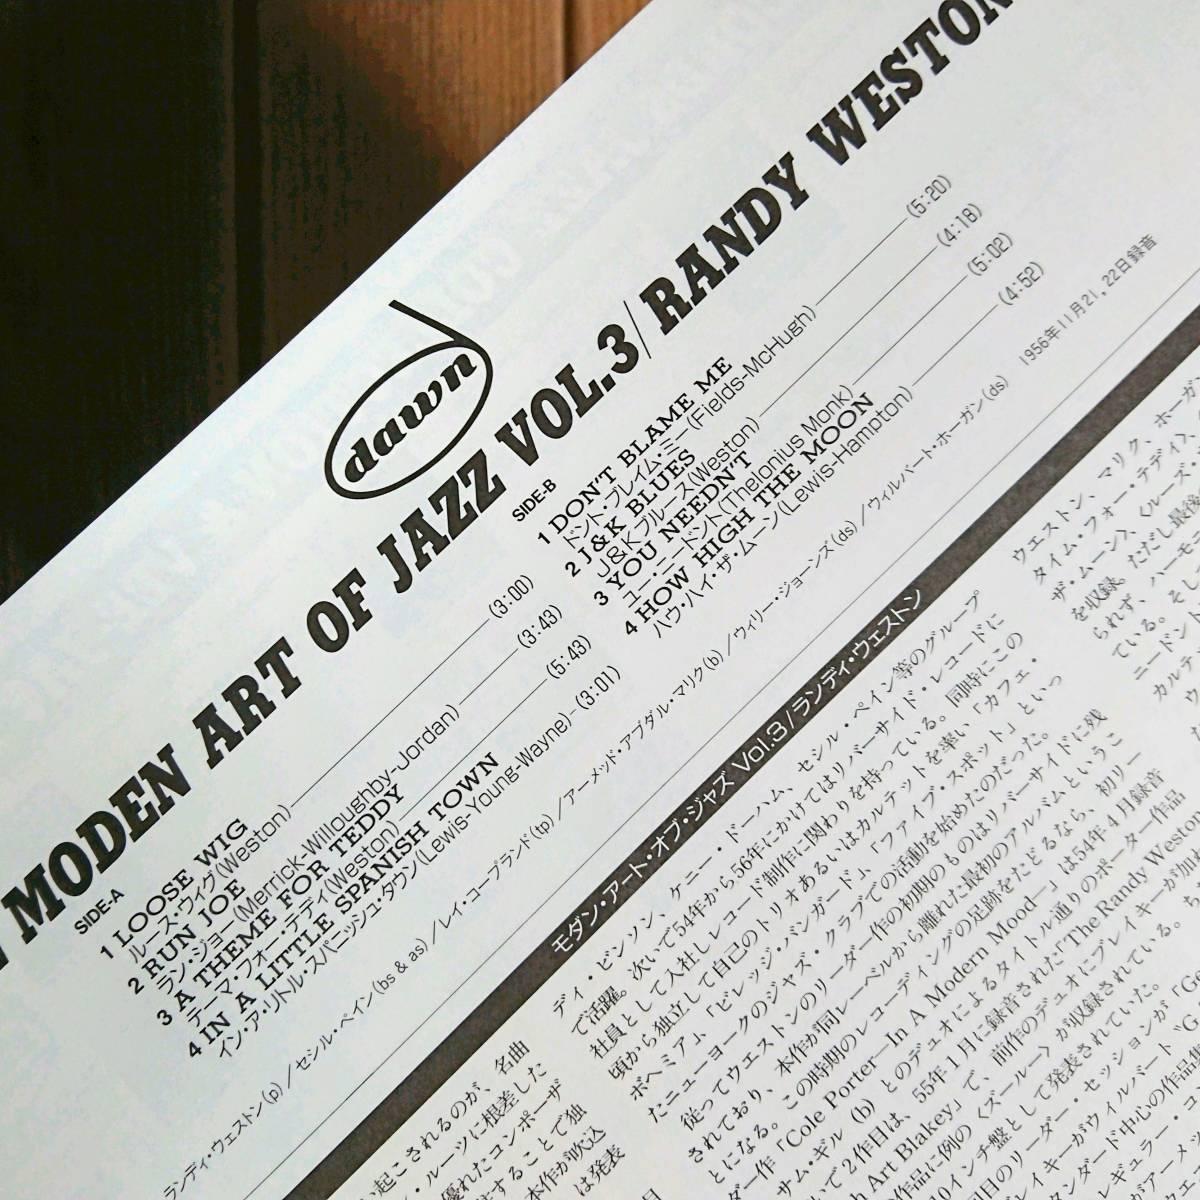 Randy Weston(p)/The Modern Art Of Jazz Vol.3 ランディ・ウエストン(p)/モダン・アート・オブ・ジャズ Vol.3【国内帯付重量盤美盤】_画像5